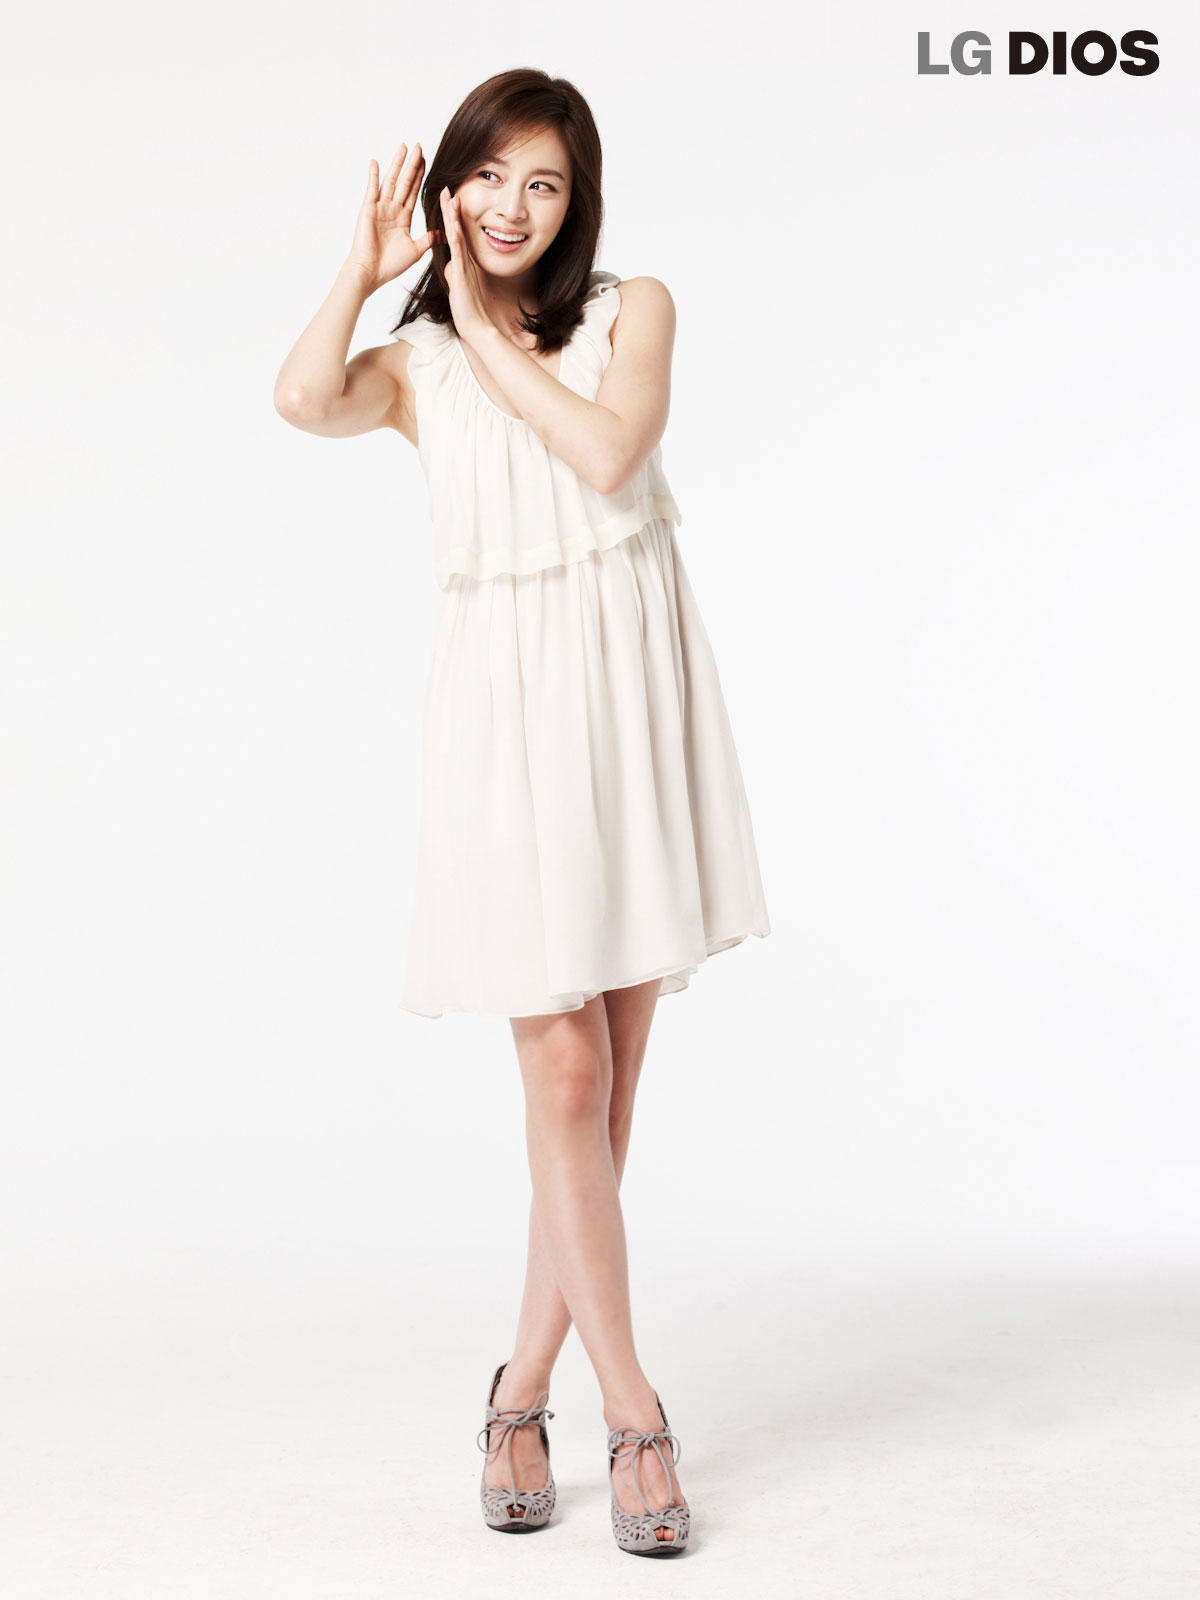 Kim Tae Hee LG DIOS smart refrigerator